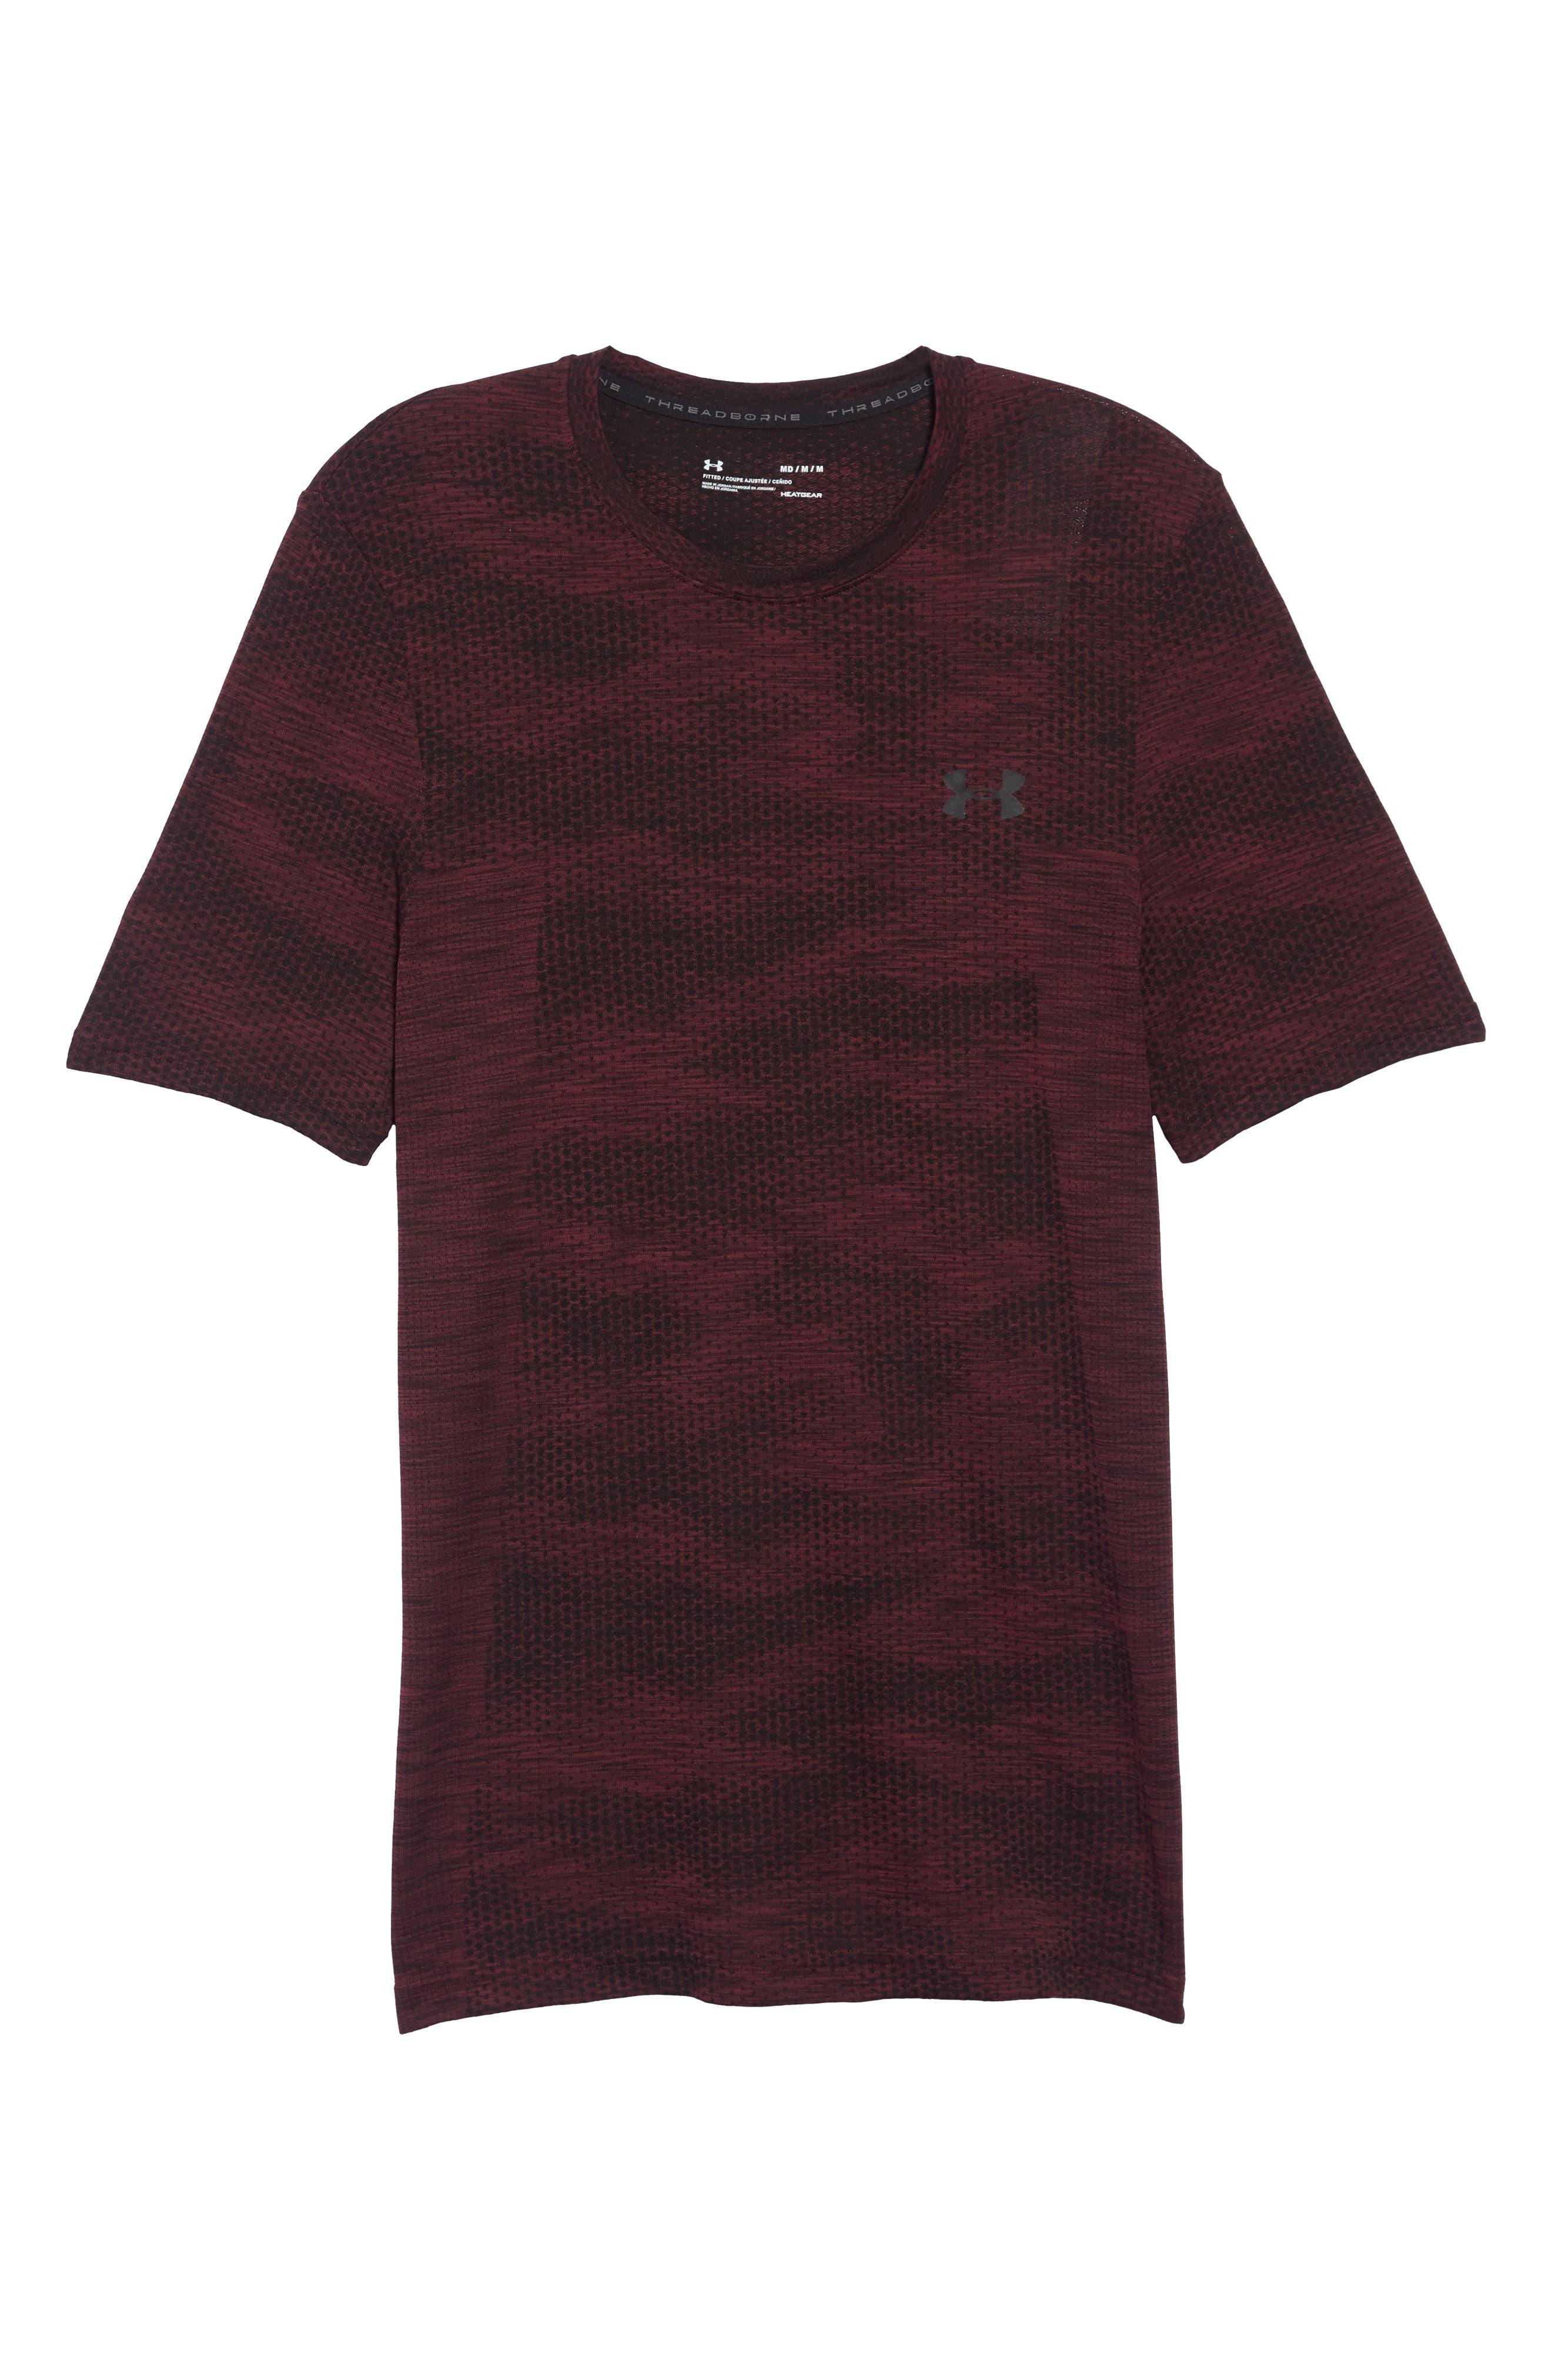 Siphon Camo Print Performance T-Shirt,                             Alternate thumbnail 6, color,                             DARK MAROON